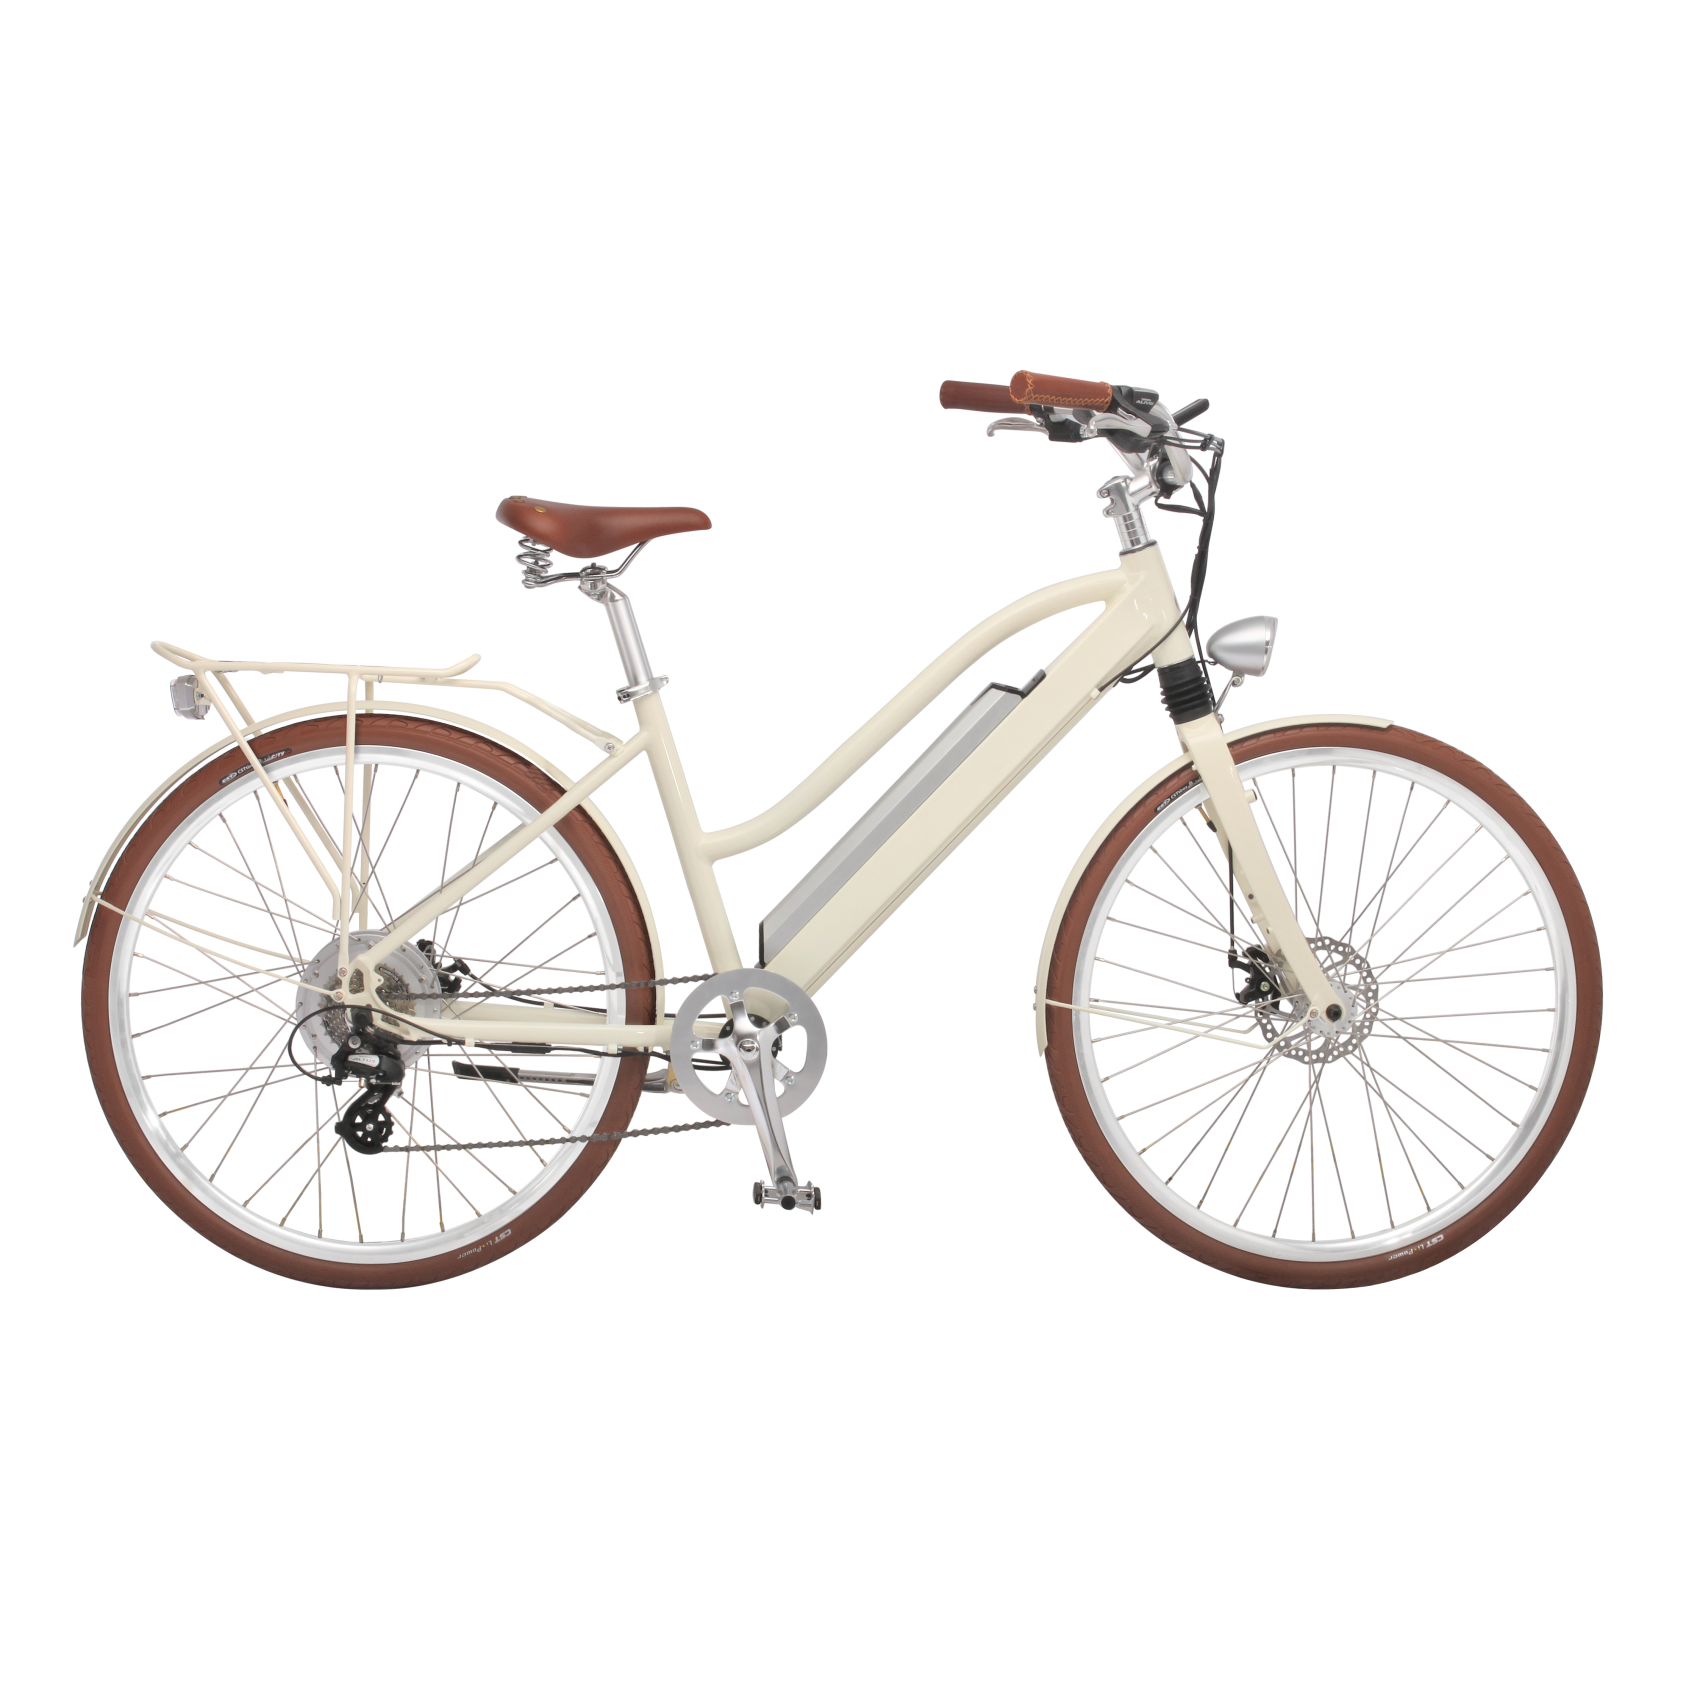 e bike snow white heckmotor 250w mit schutzblech. Black Bedroom Furniture Sets. Home Design Ideas